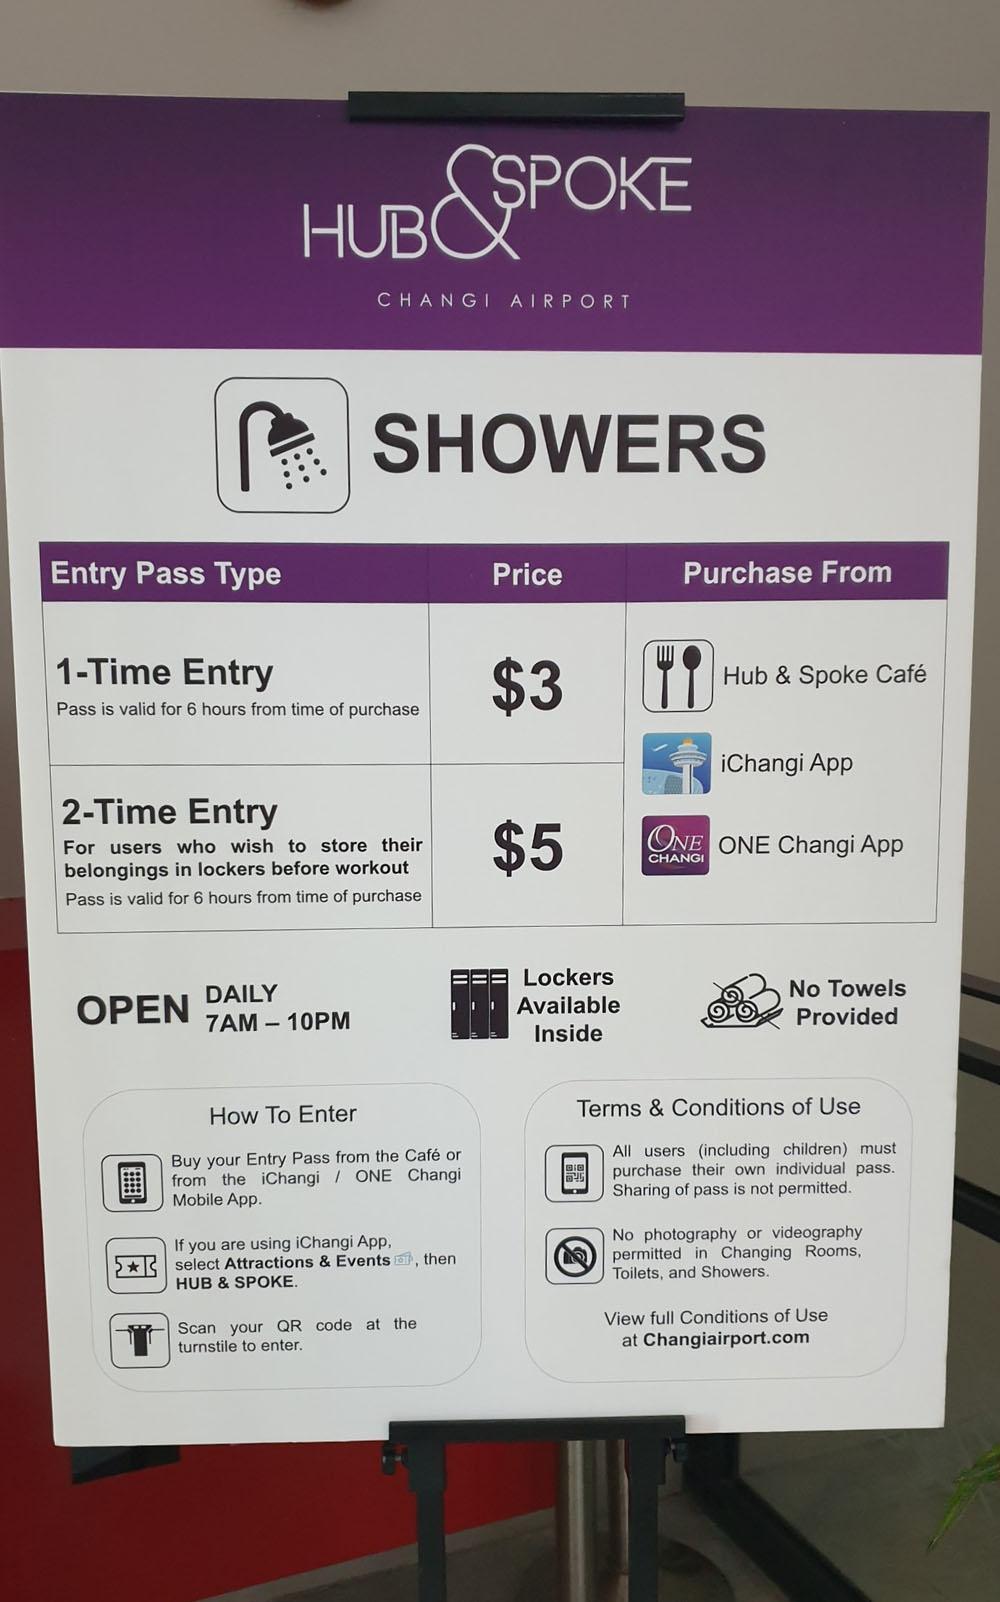 Hub & Spoke Cafe Shower Fee